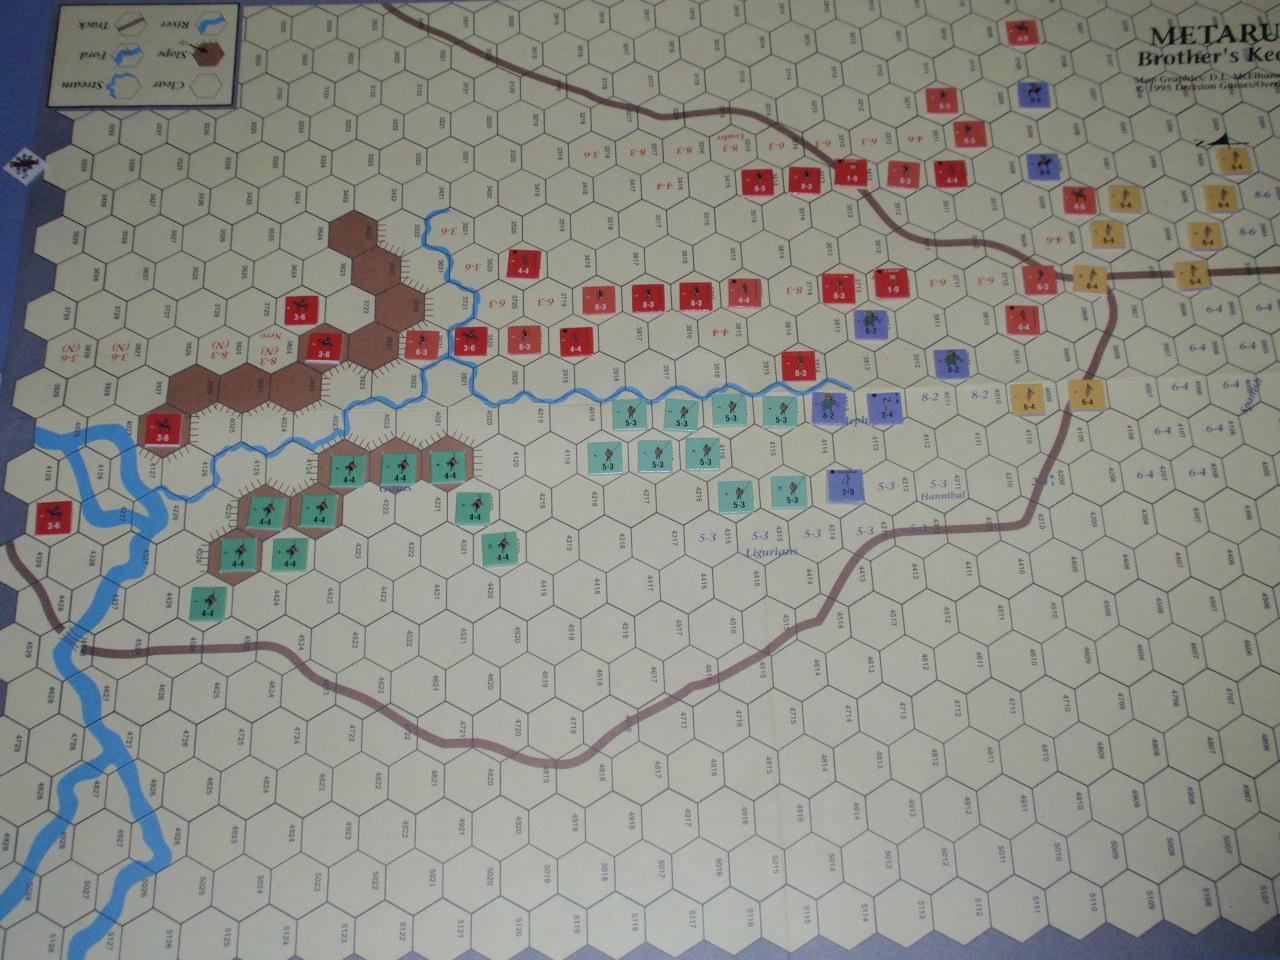 DG「Battles of the Ancient World」シリーズから「Metauras 207B.C.」をソロプレイ②_b0162202_20143319.jpg